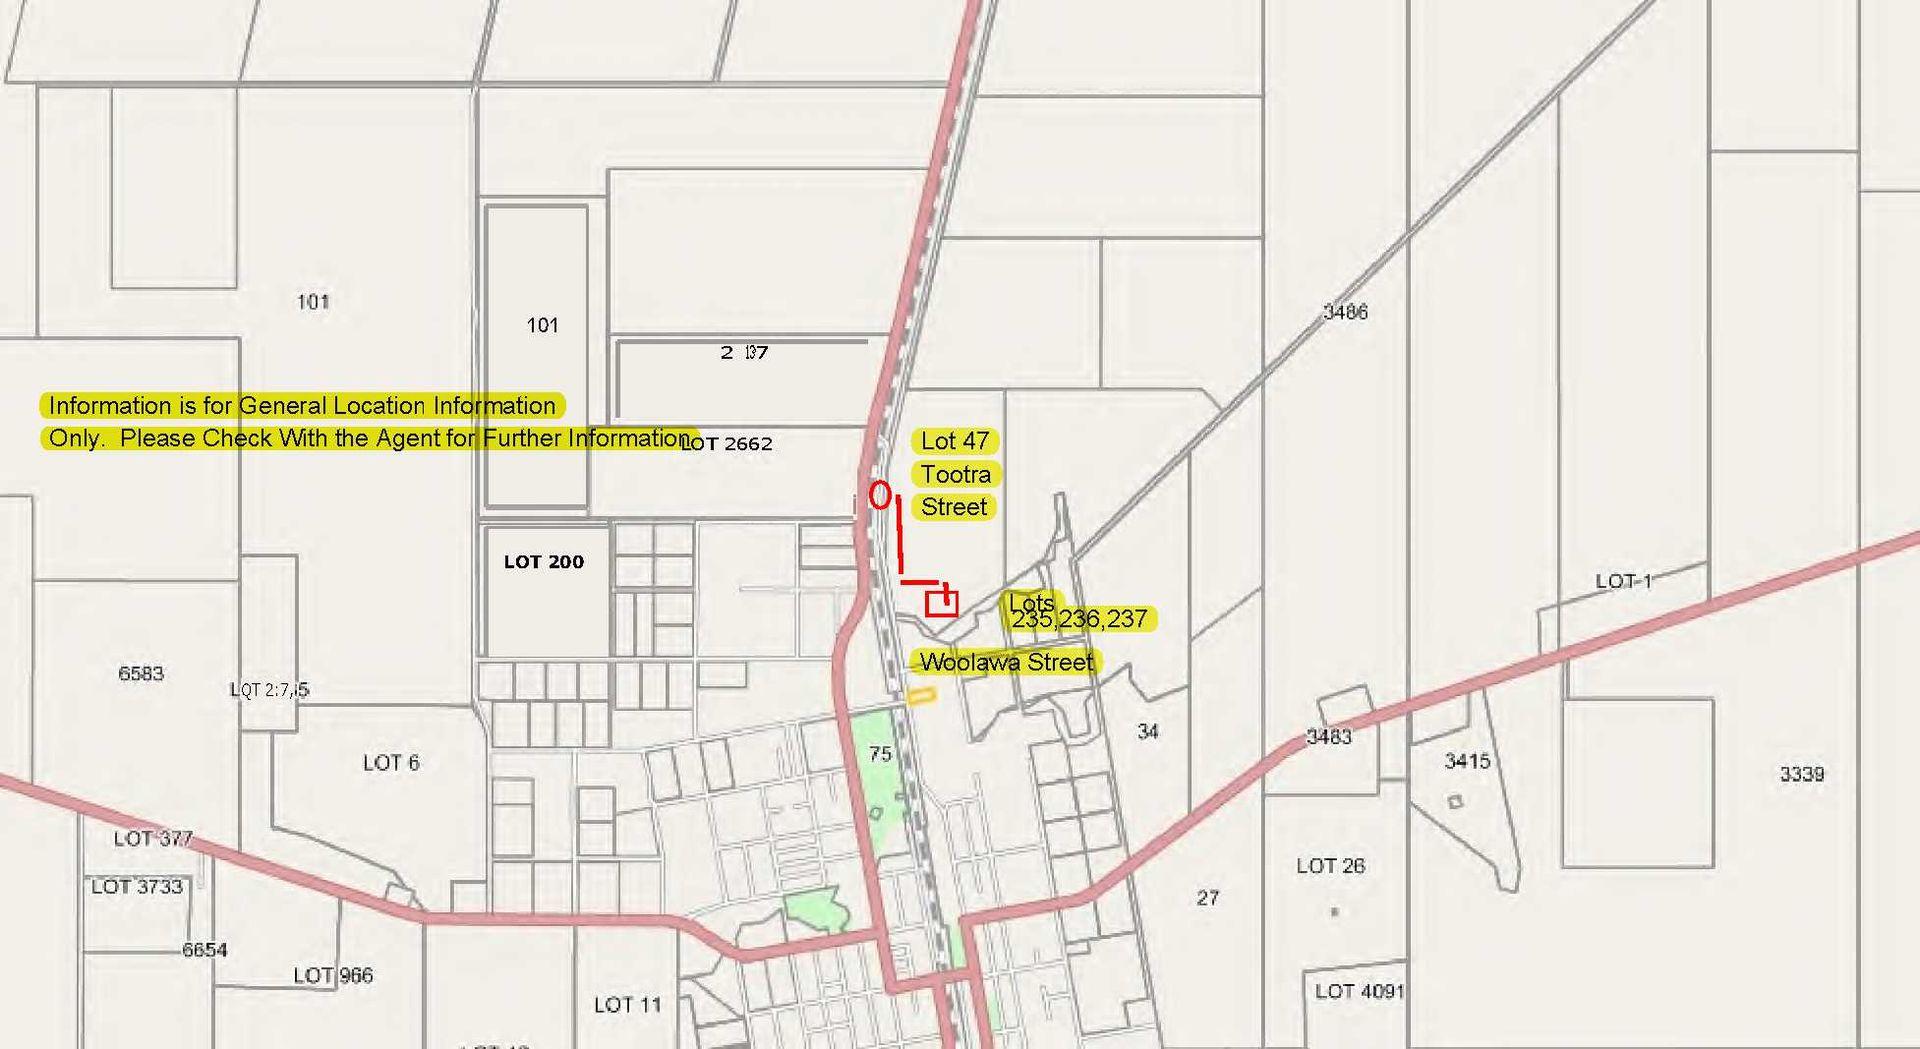 235 236 237 Woolawa Street, Moora WA 6510, Image 2